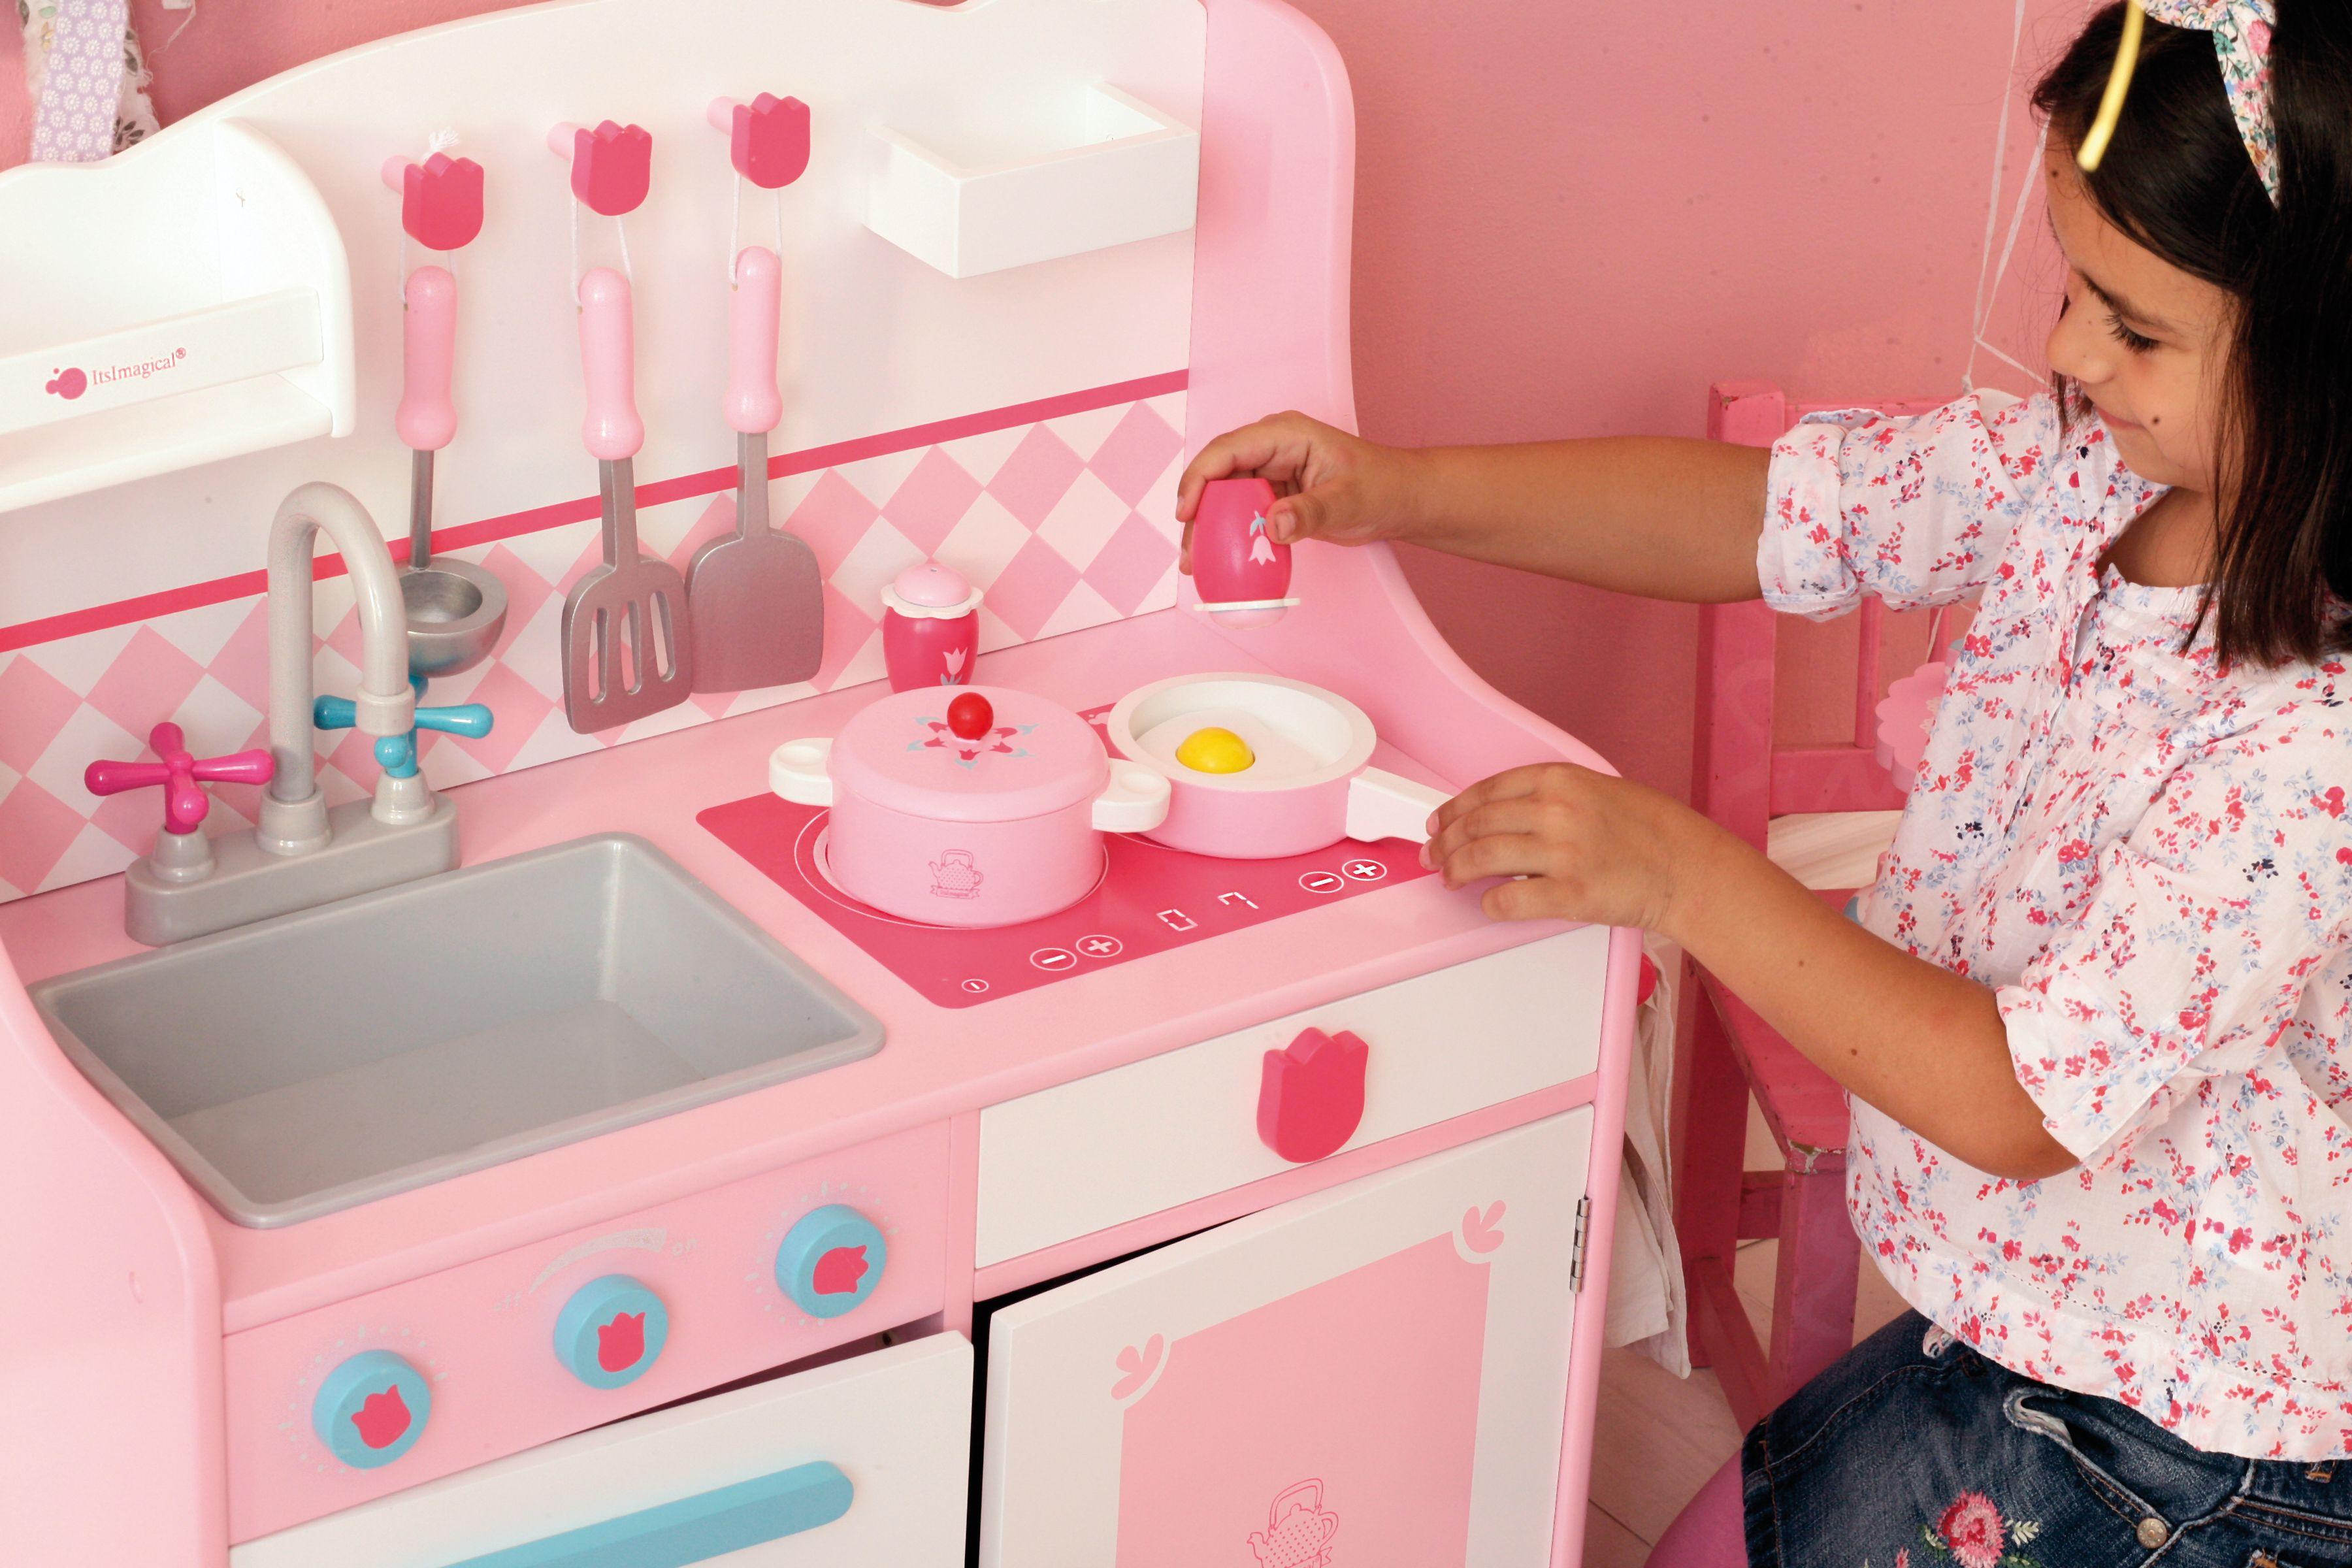 Cocinita de juguete de madera cocina con ni os - Cocina madera imaginarium ...